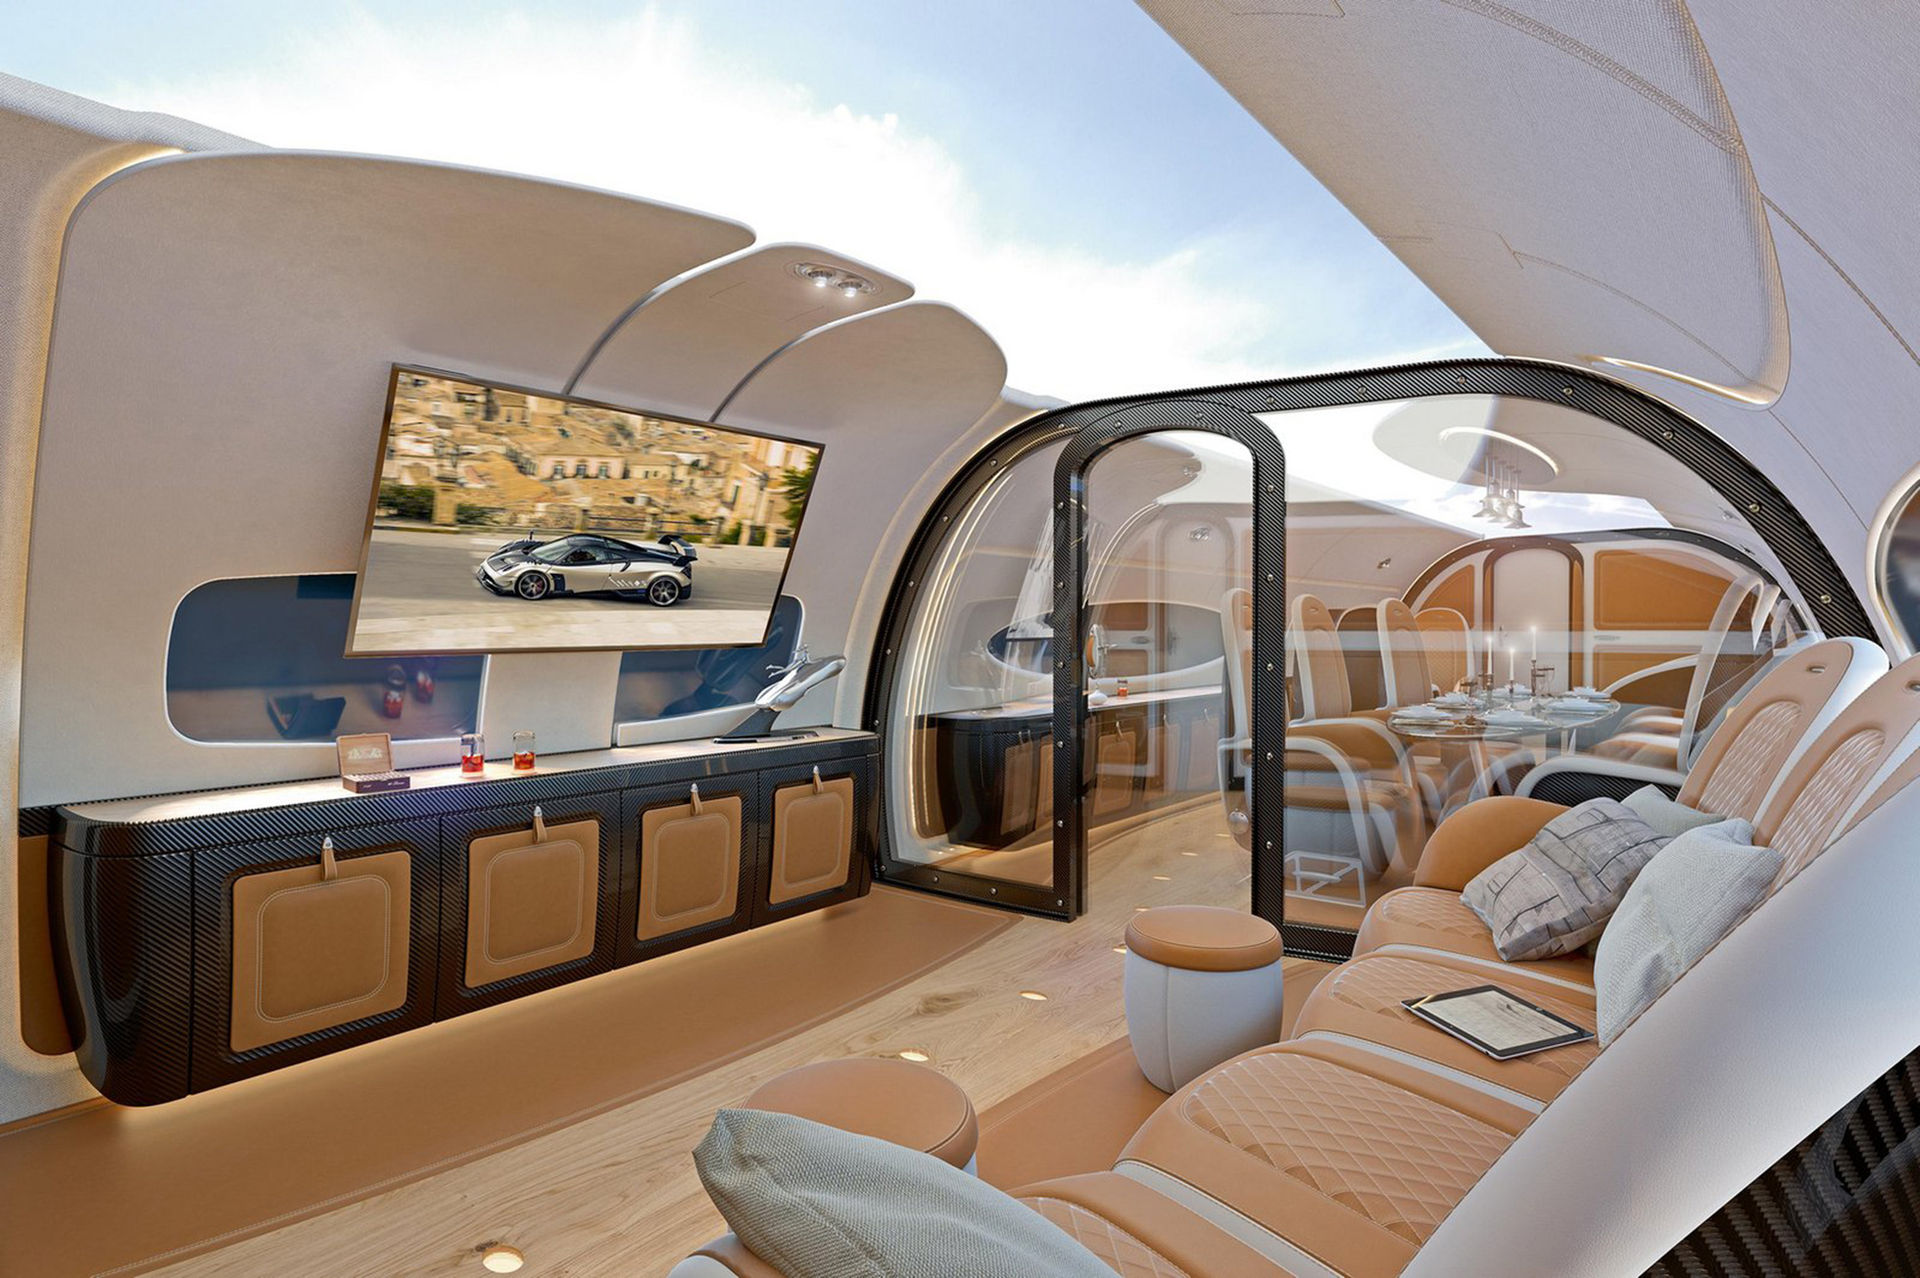 Pagani designar flygplanskabin åt Airbus